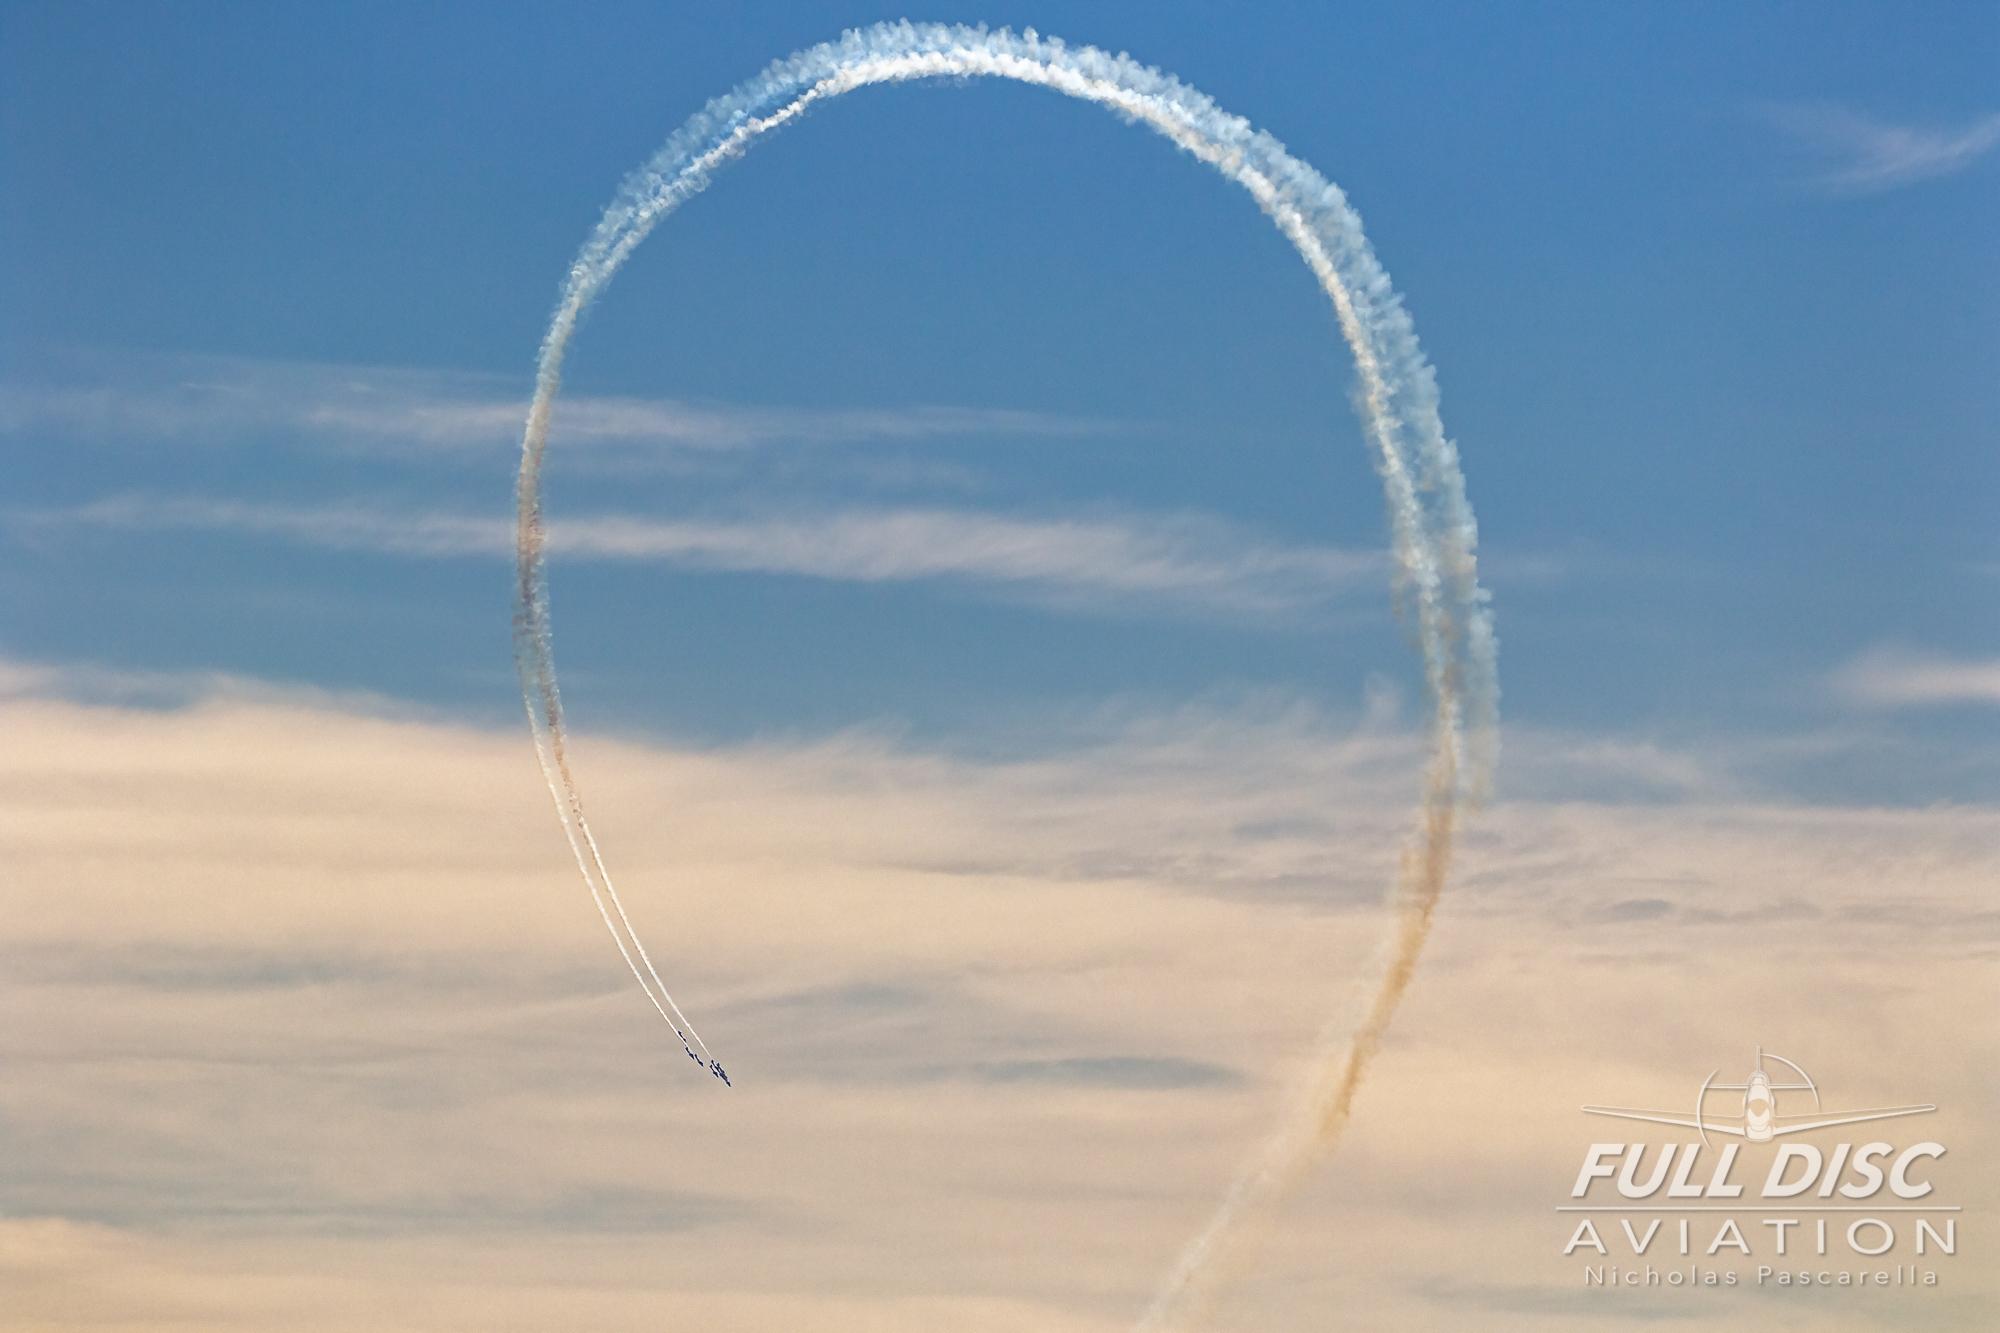 nickpascarella_fulldiscaviation_oceancityairshow_aviation_snowbirdsloop.jpg